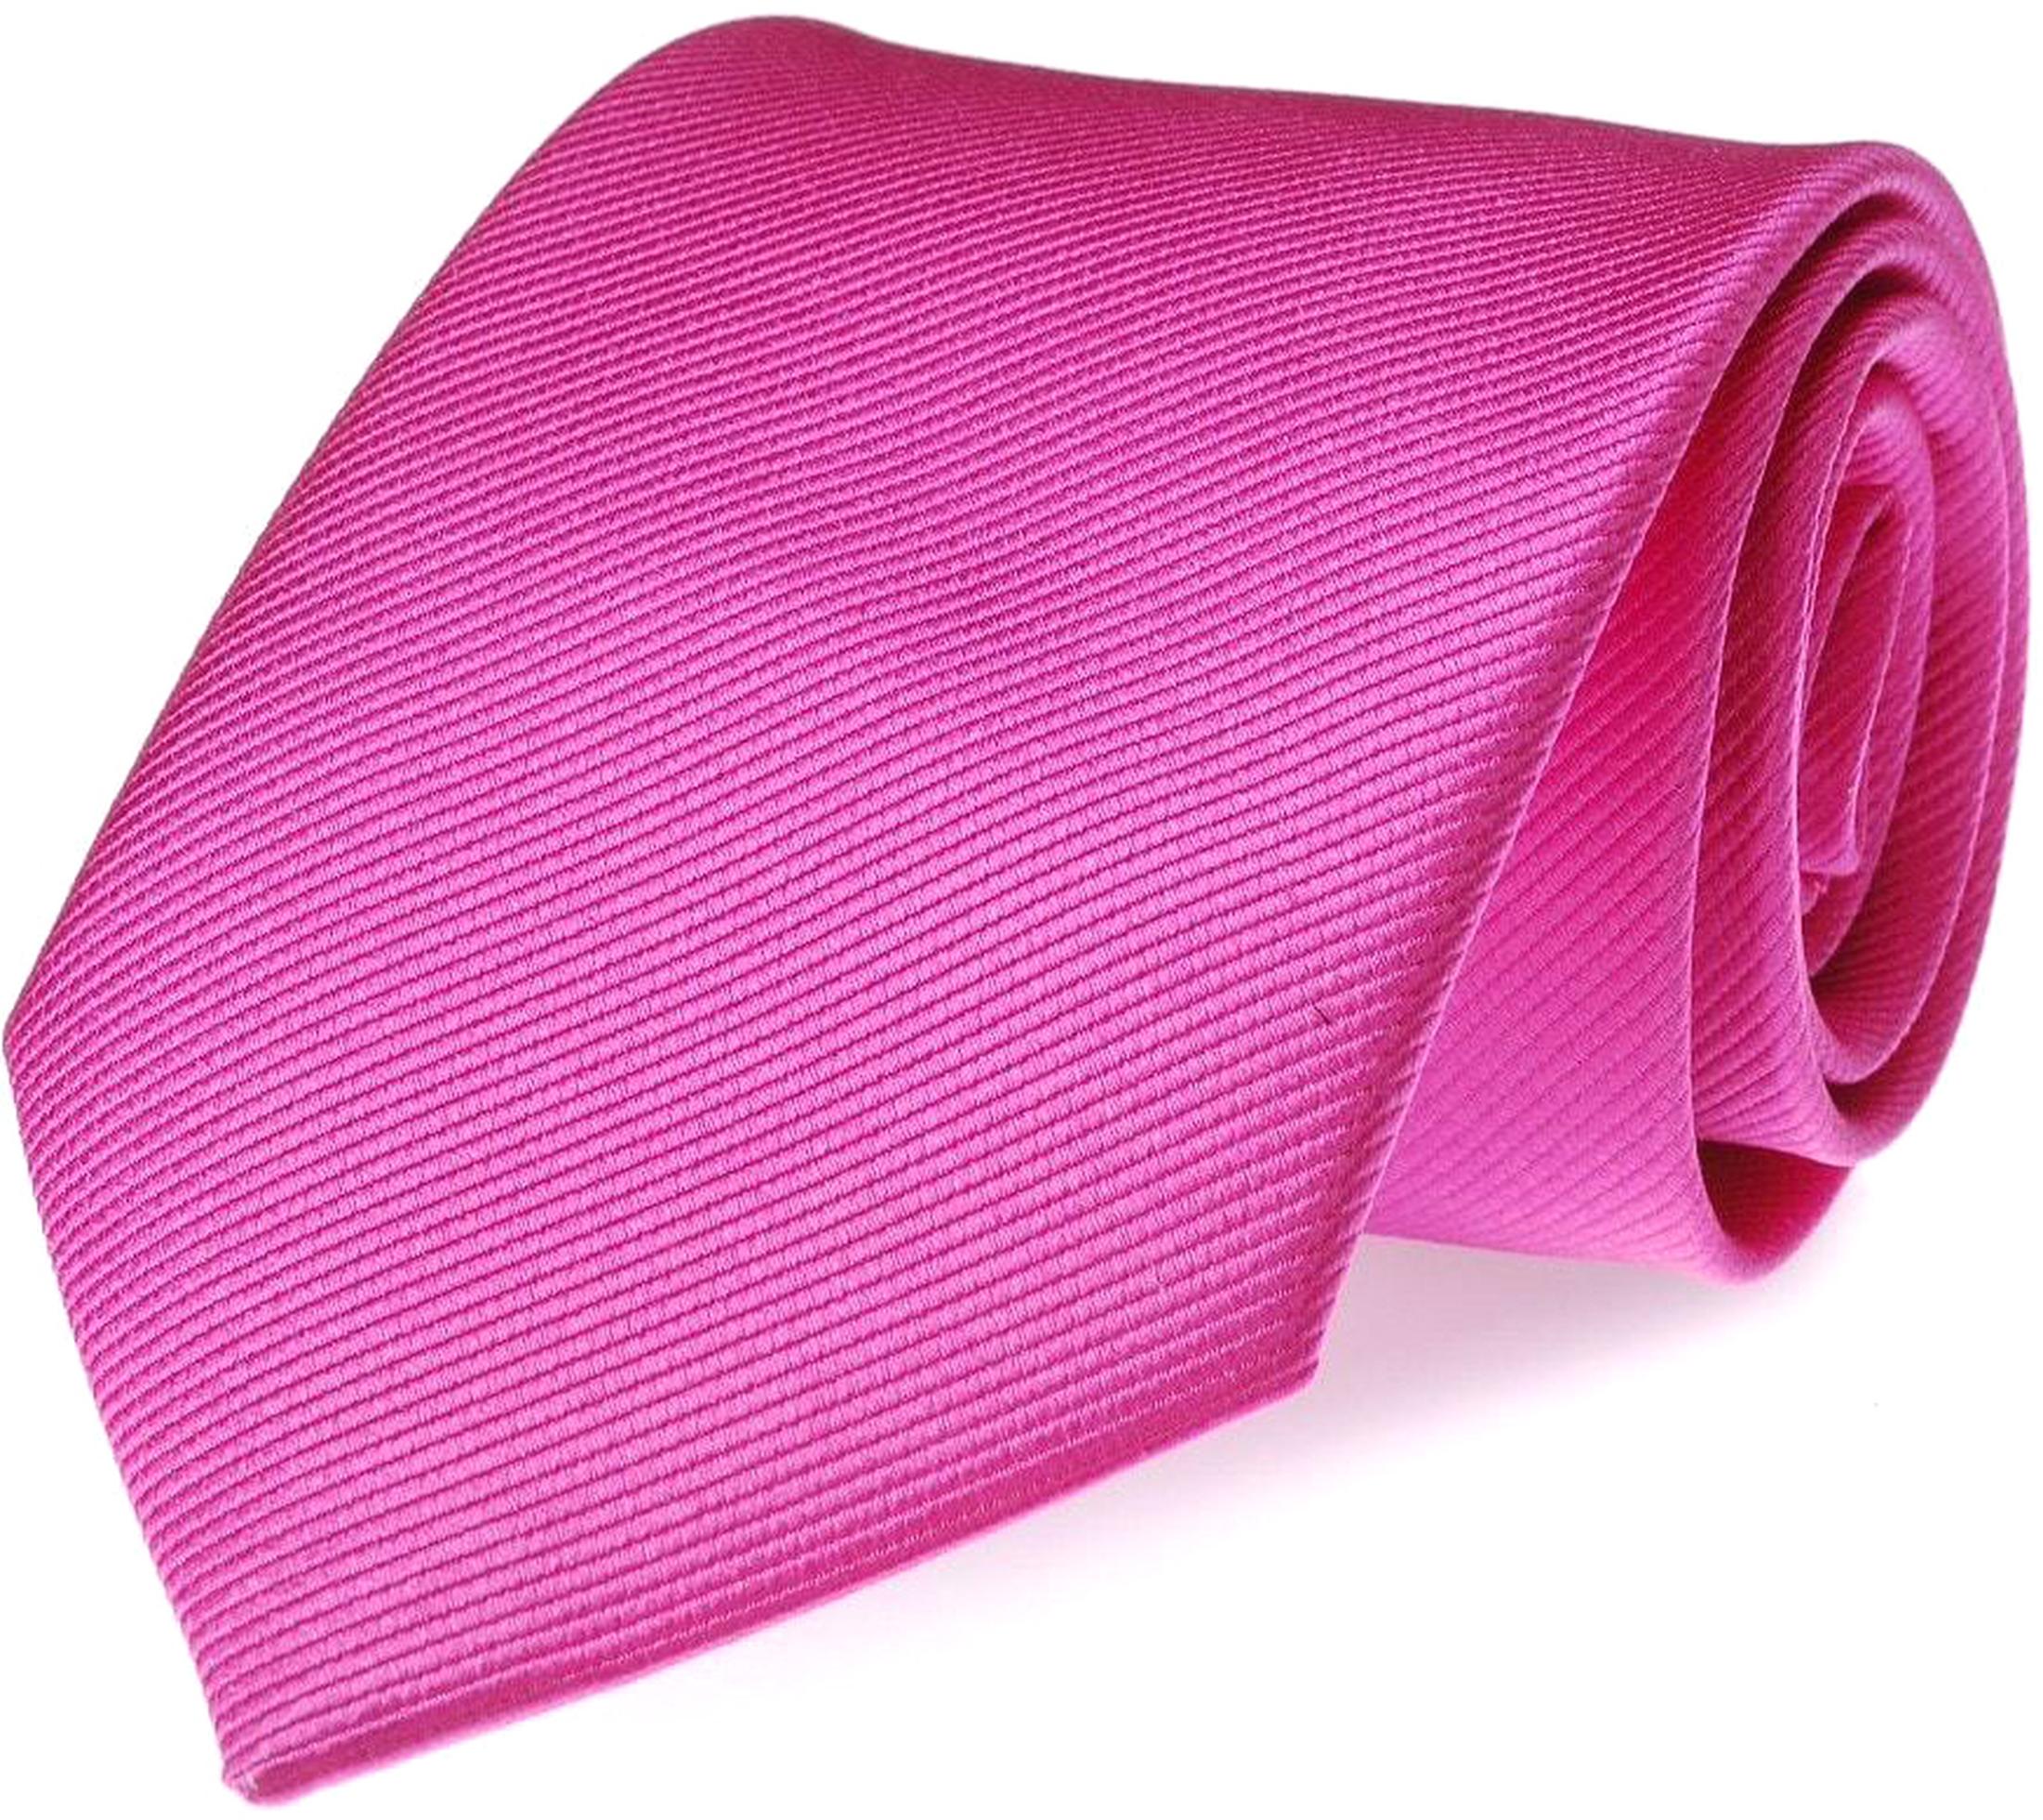 Krawatte Seide Fuchsia Uni F21 foto 0